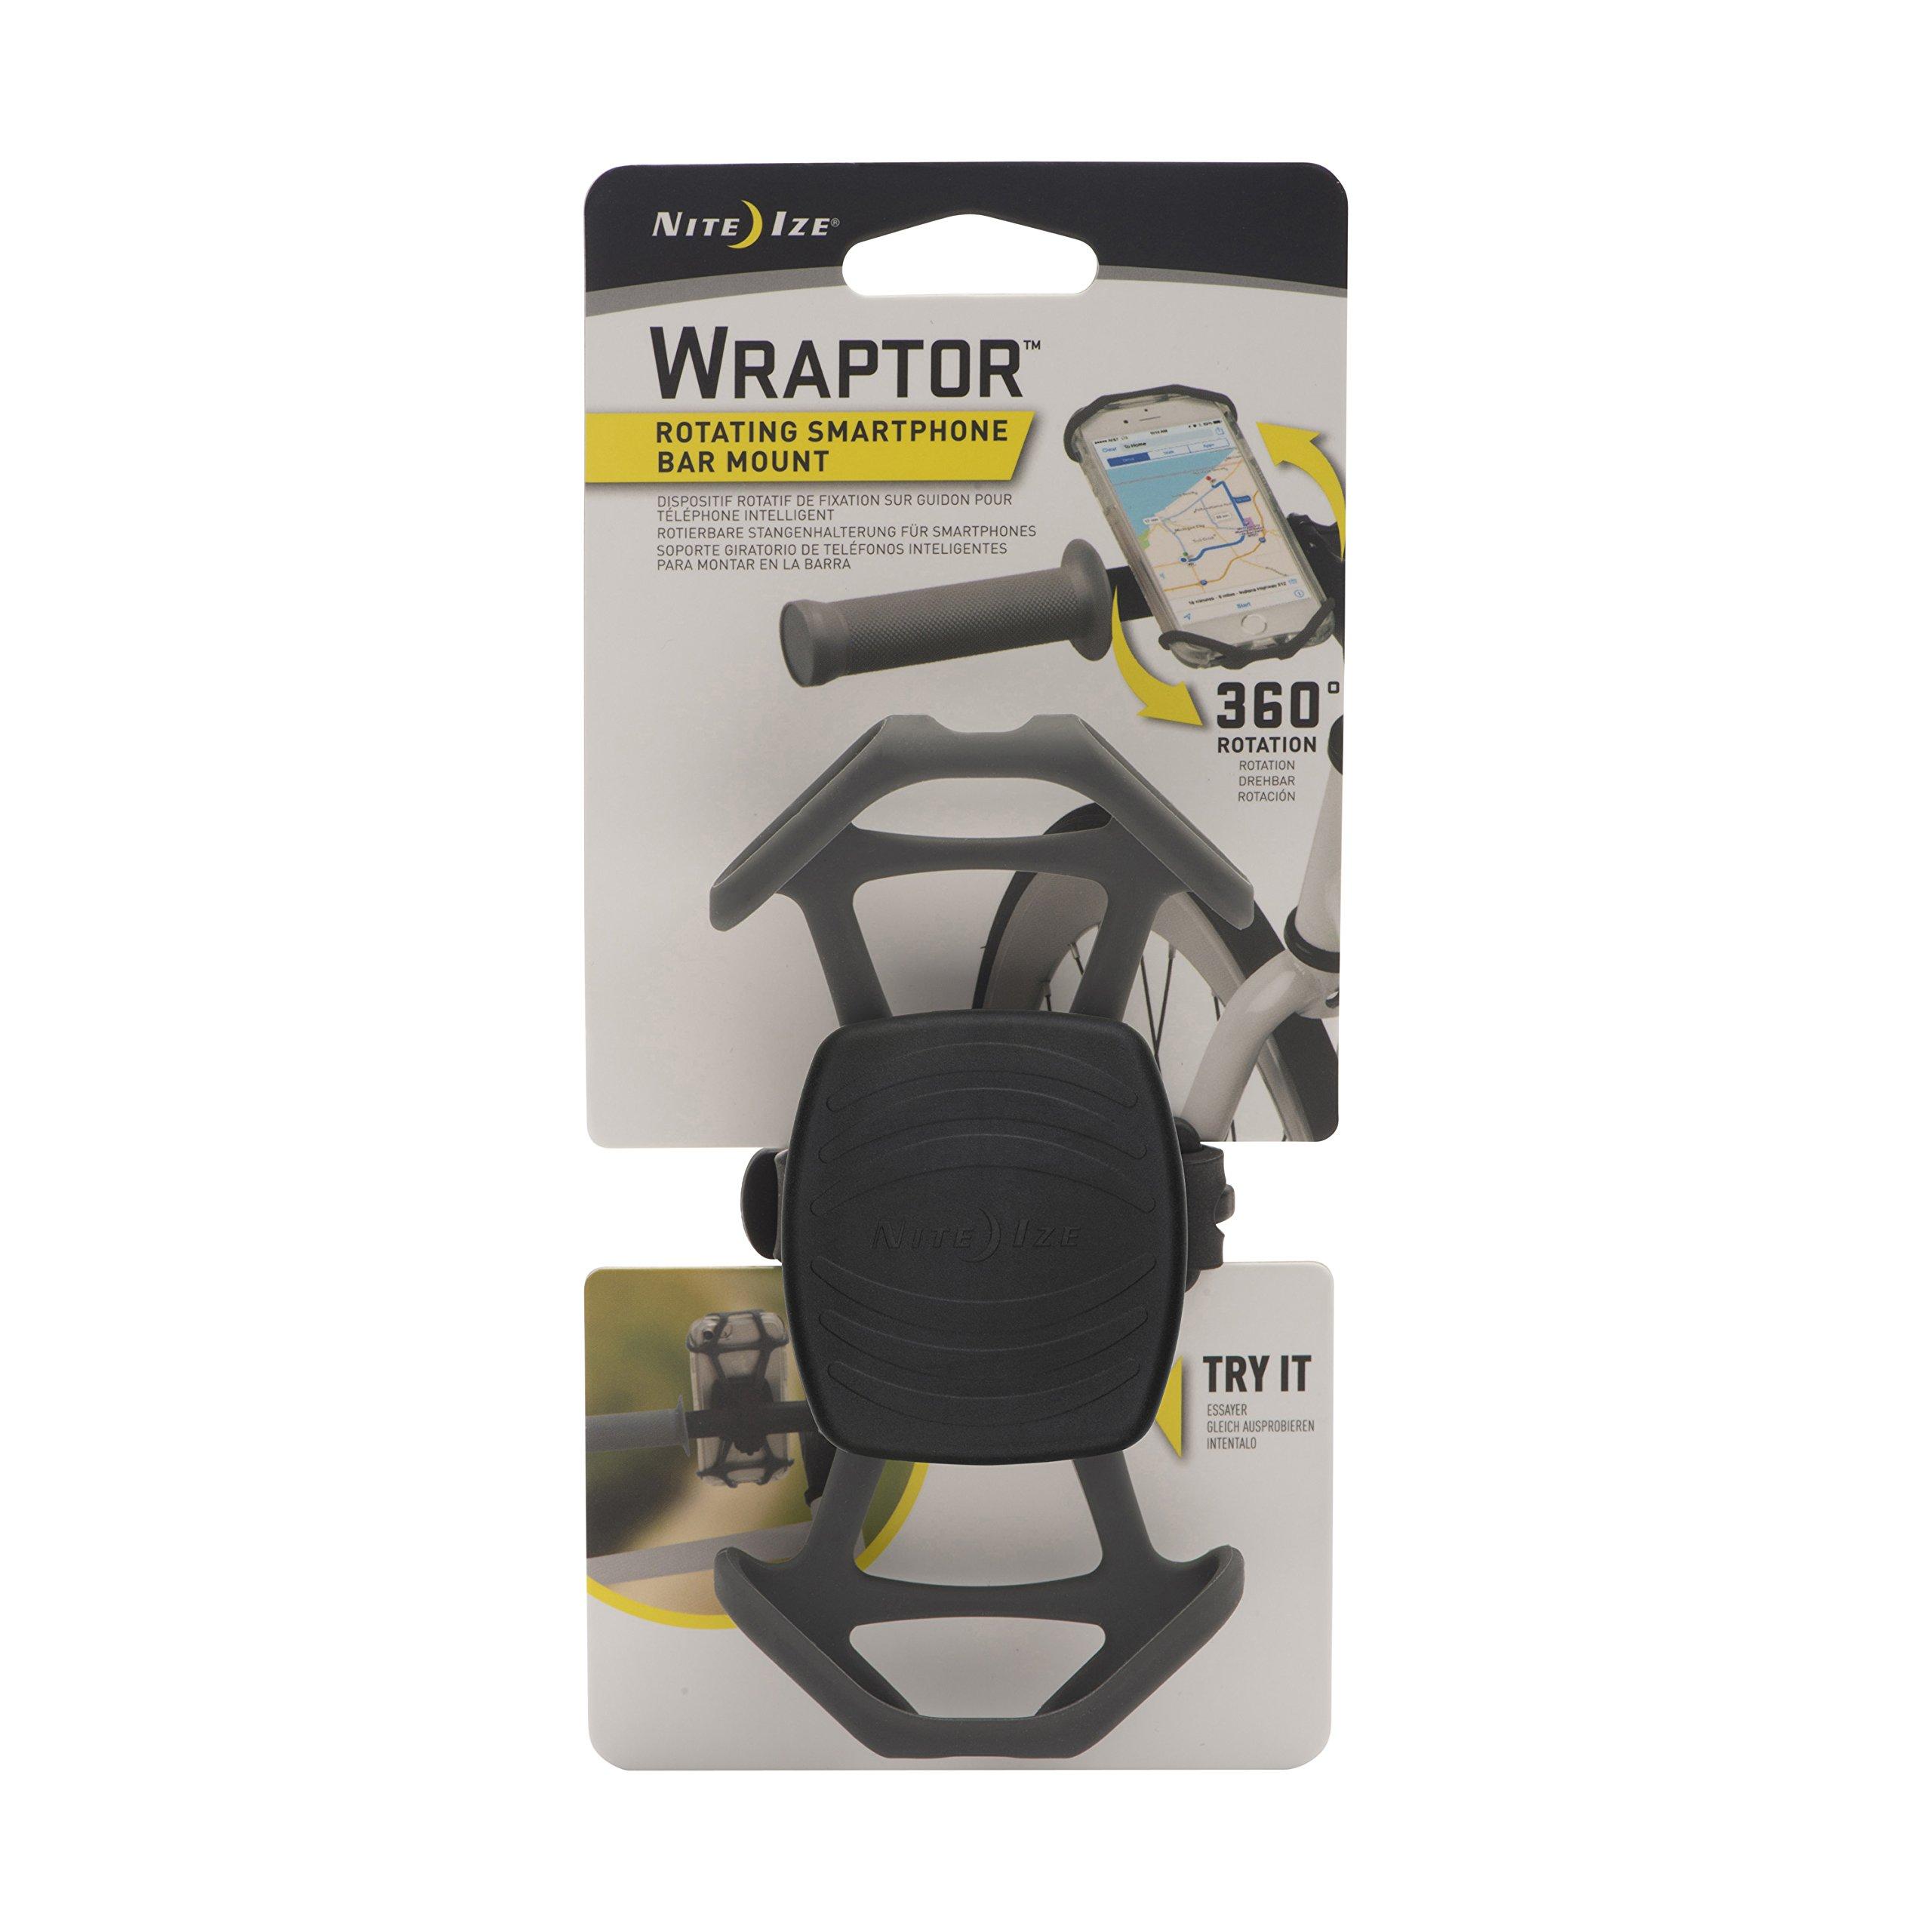 Nite Ize Wraptor, Rotating Smartphone Bar Mount, Charcoal